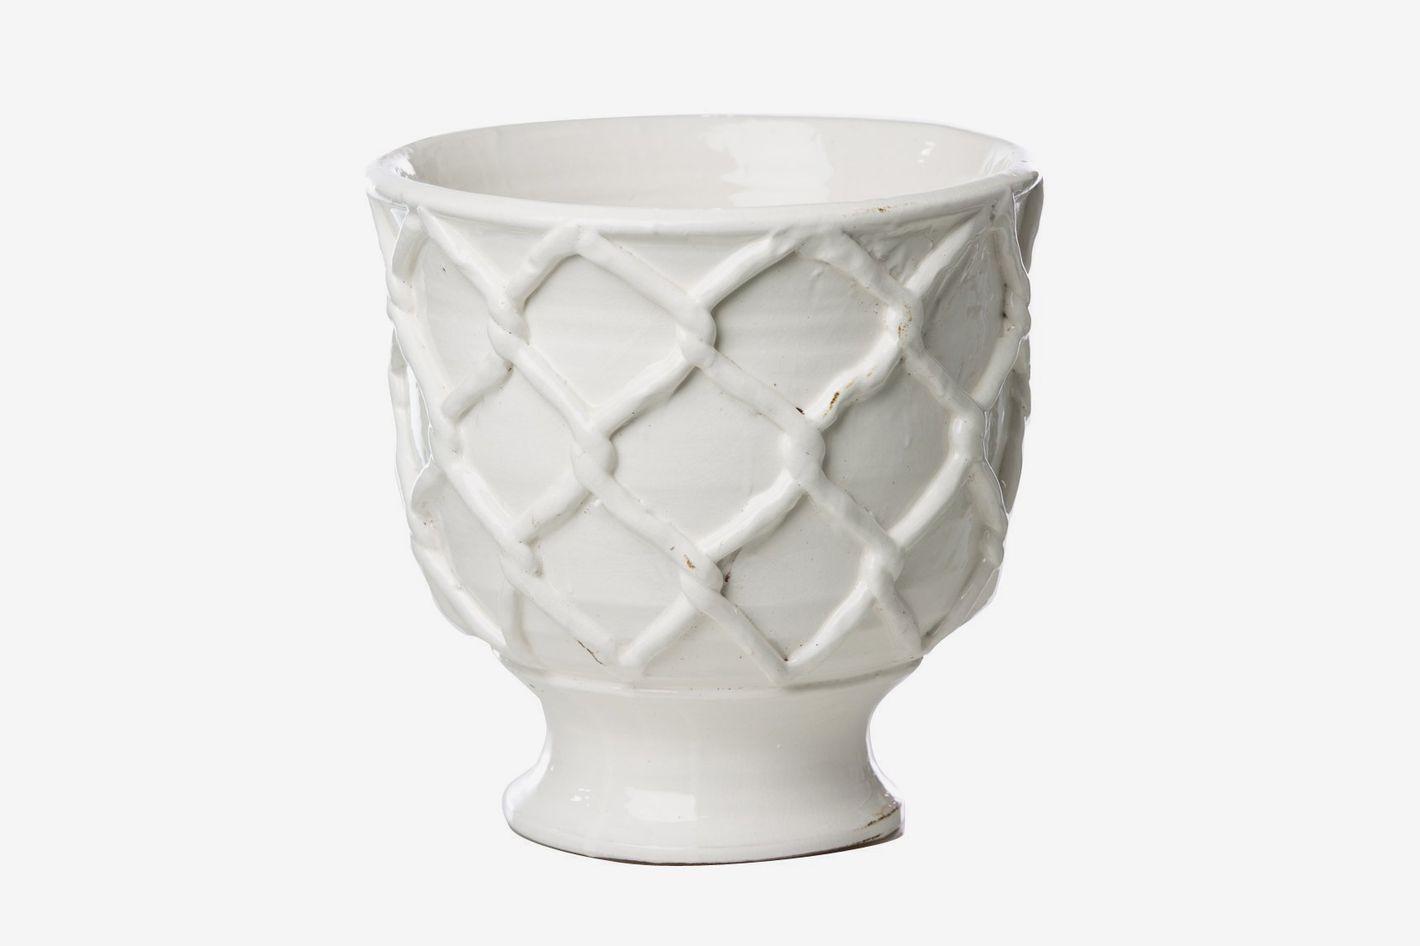 Abigail's Ceramic Vinci Criss Cross Pattern Planter, White, Large 11-inch